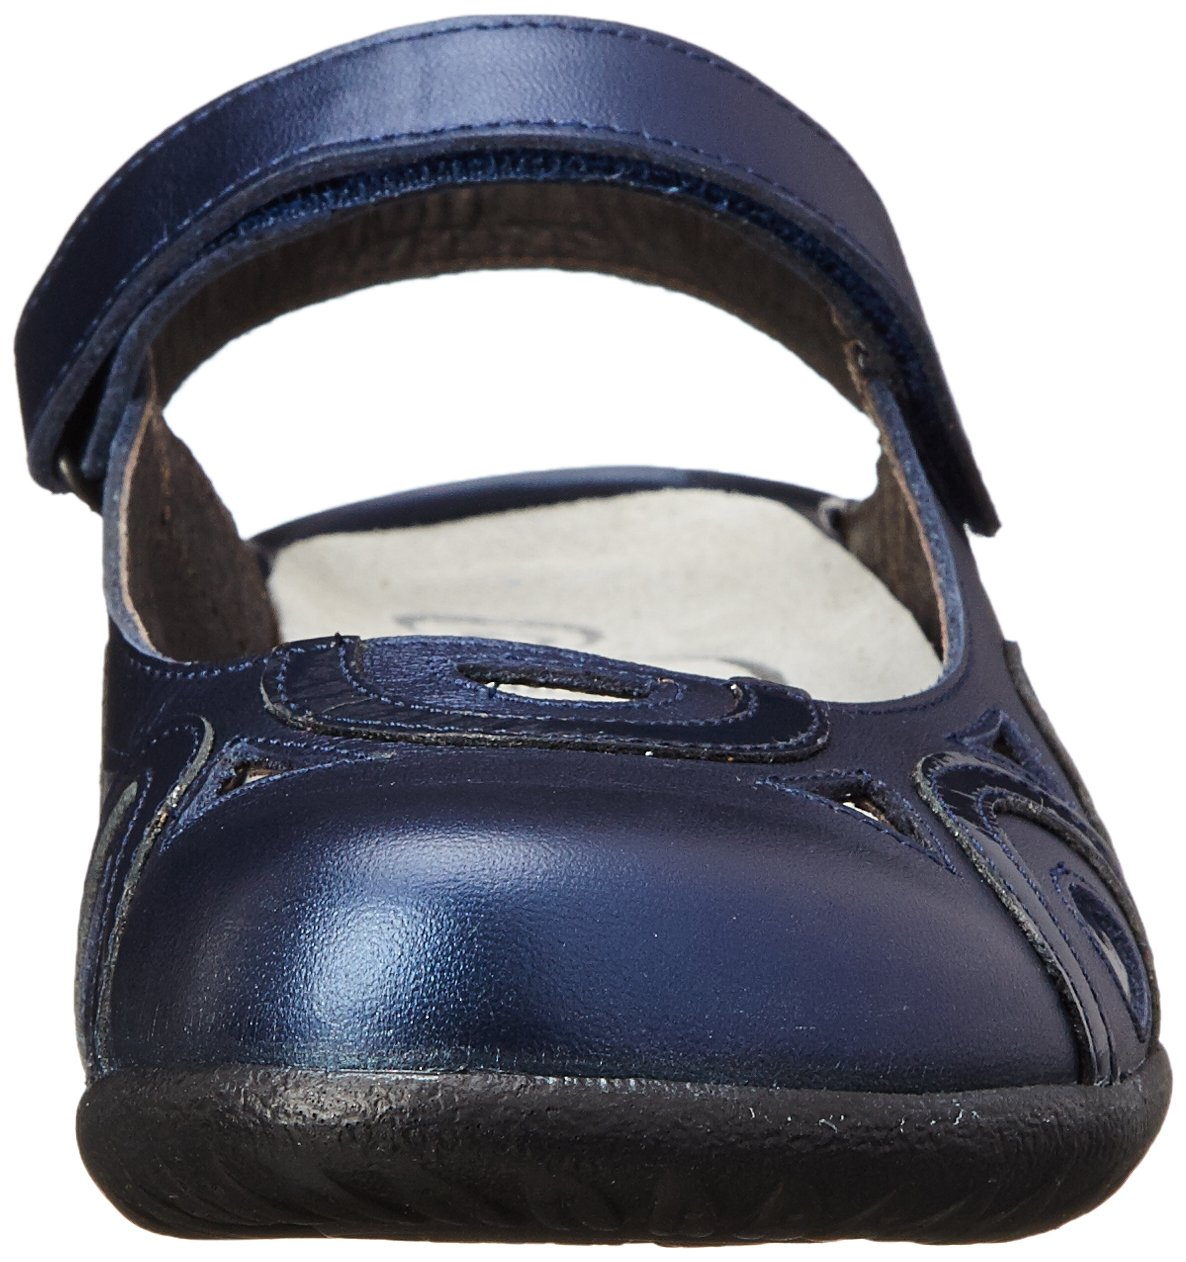 NAOT Women's Rongo Mary Jane Flat B00S7DP6MY 40 EU/8.5-9 M US|Polar Sea Leather/Navy Patent Leather